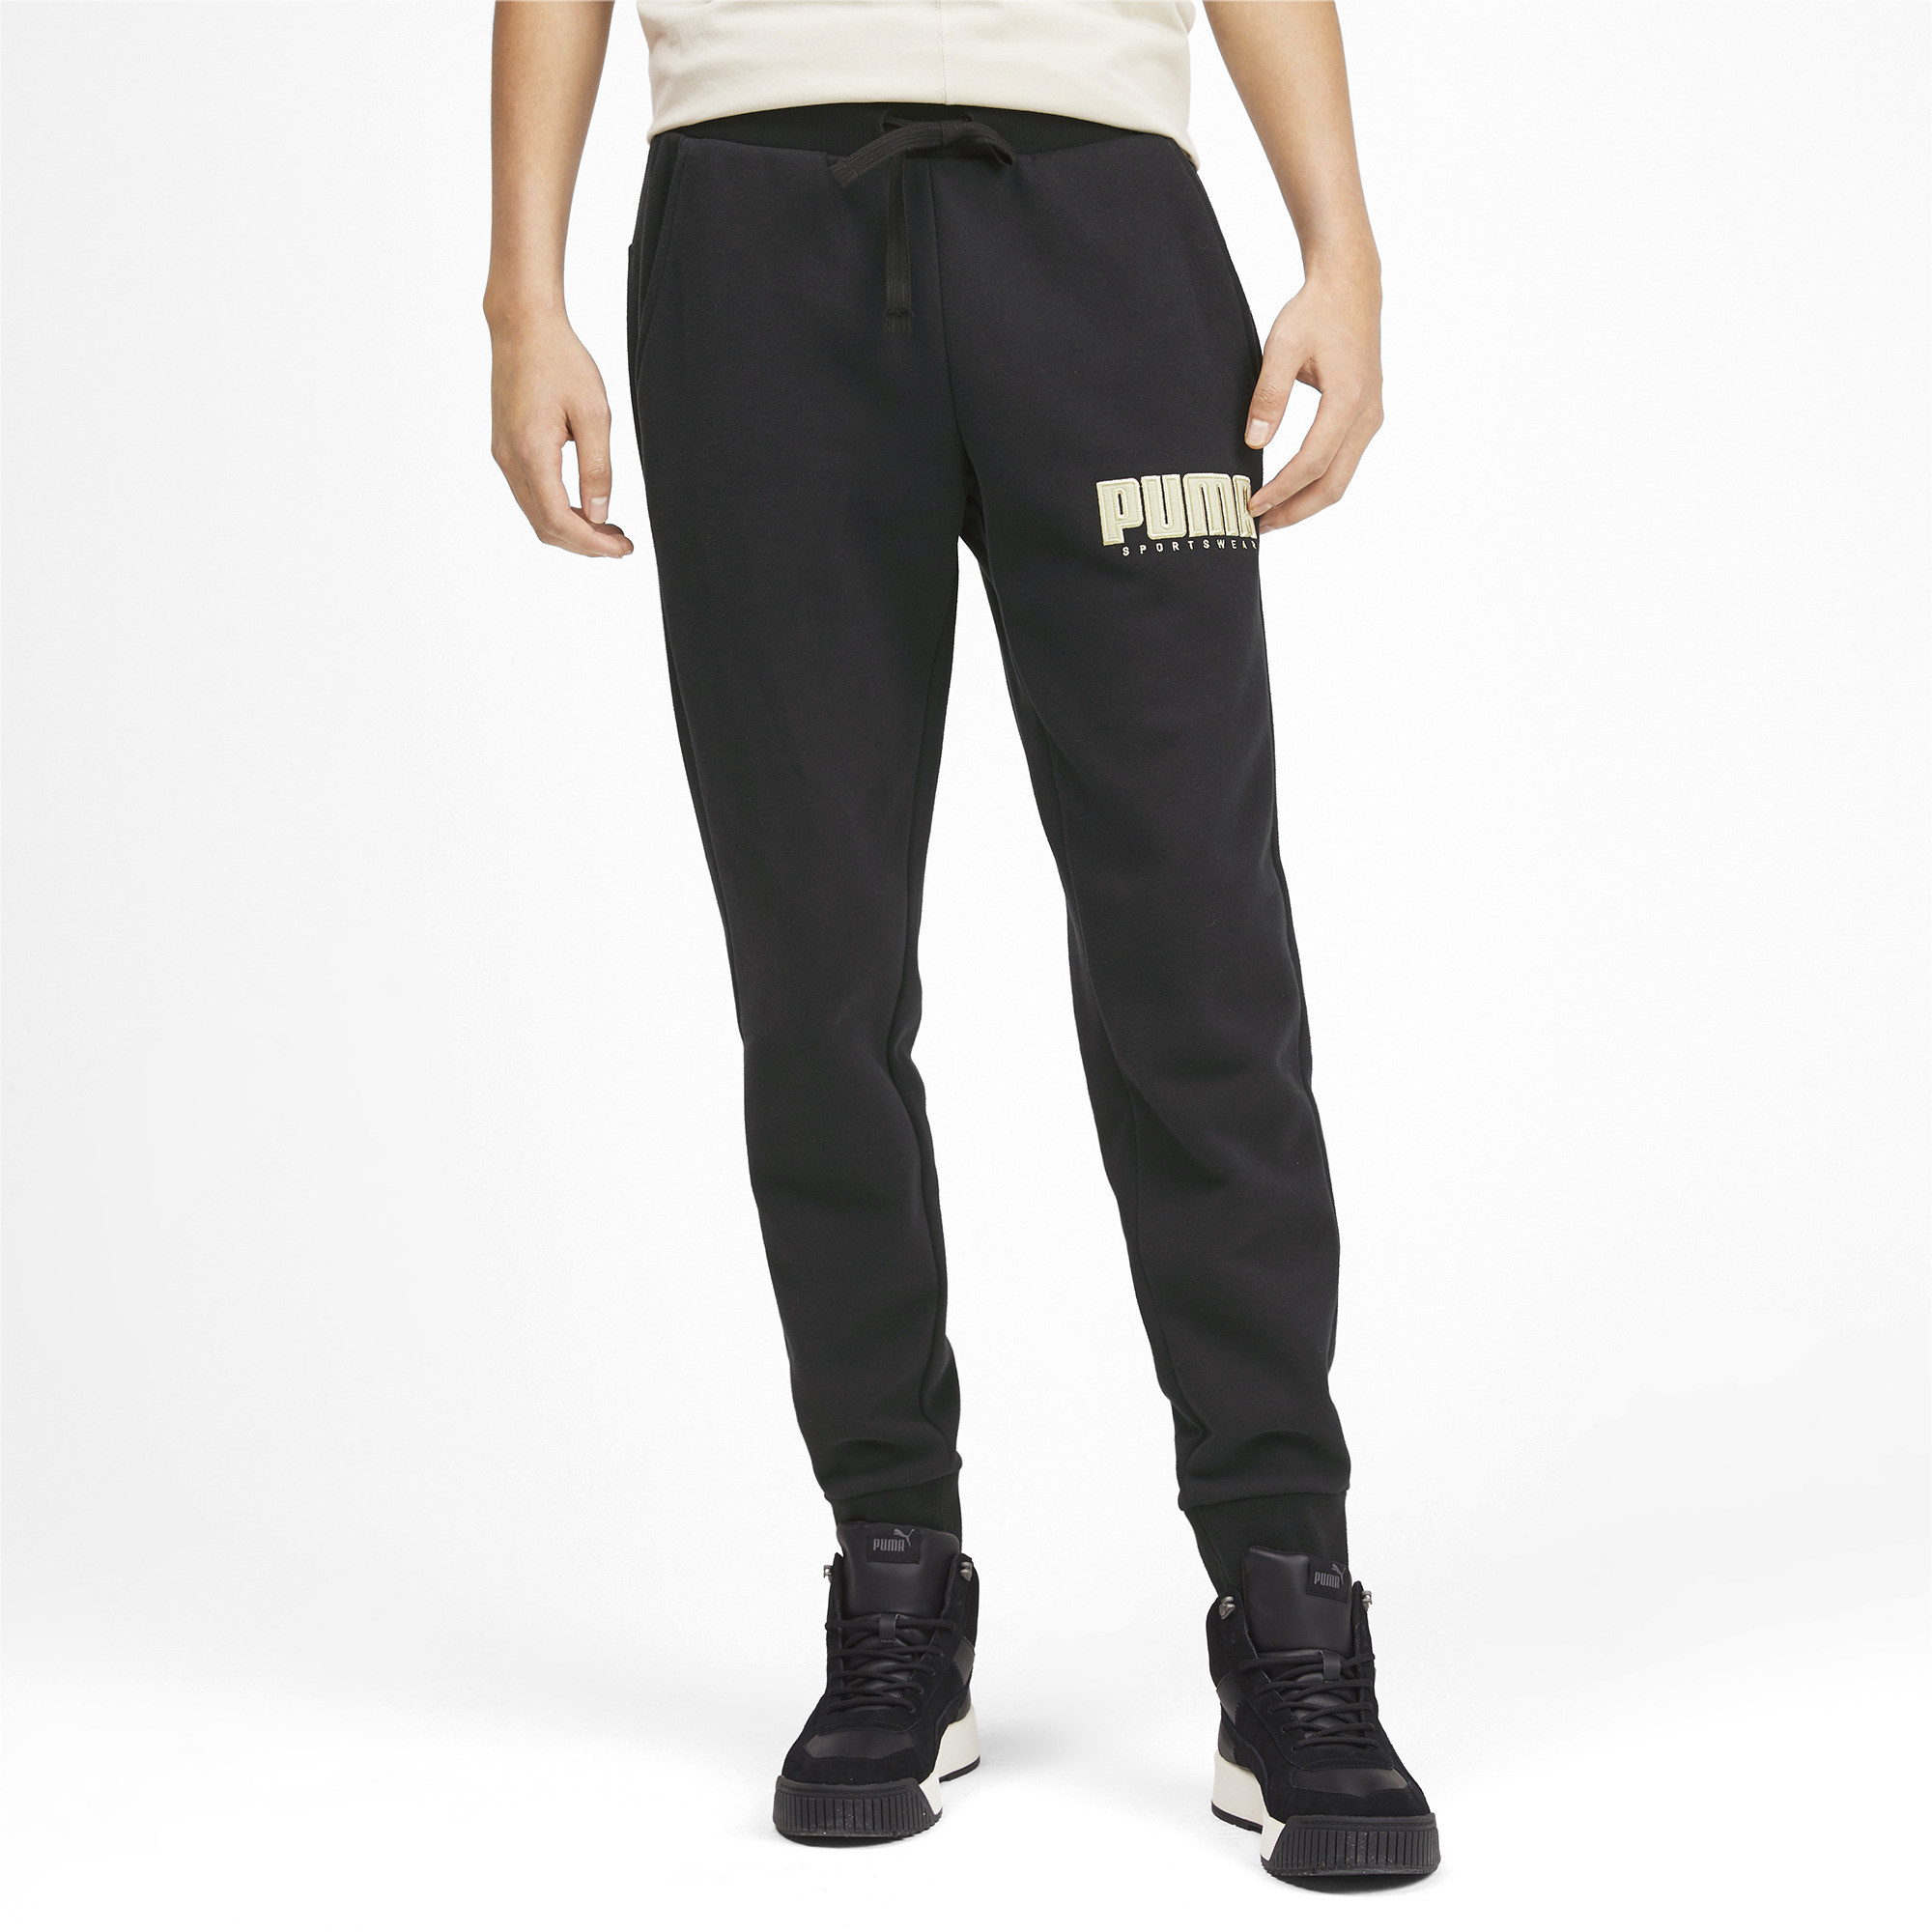 PUMA-Athletics-Men-039-s-Fleece-Pants-Men-Knitted-Pants-Basics thumbnail 9